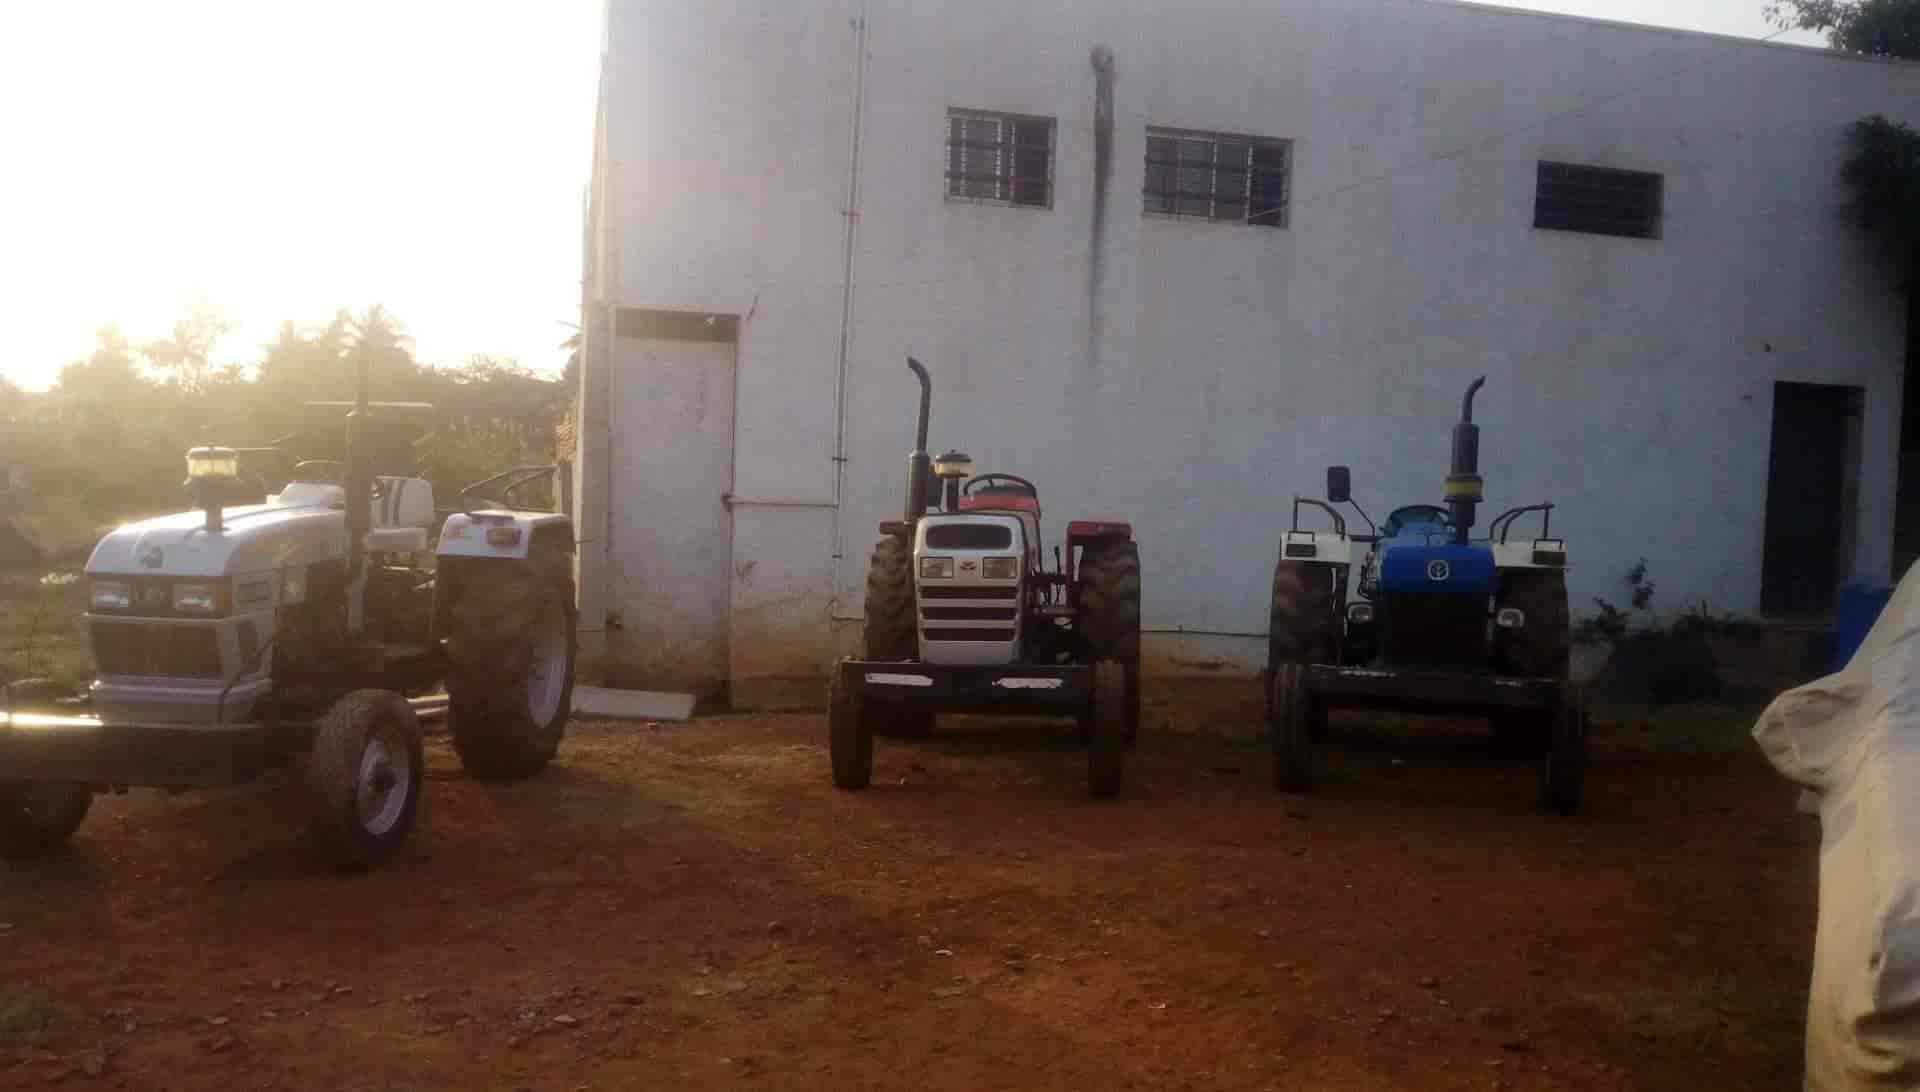 Olx Tractor Hubli